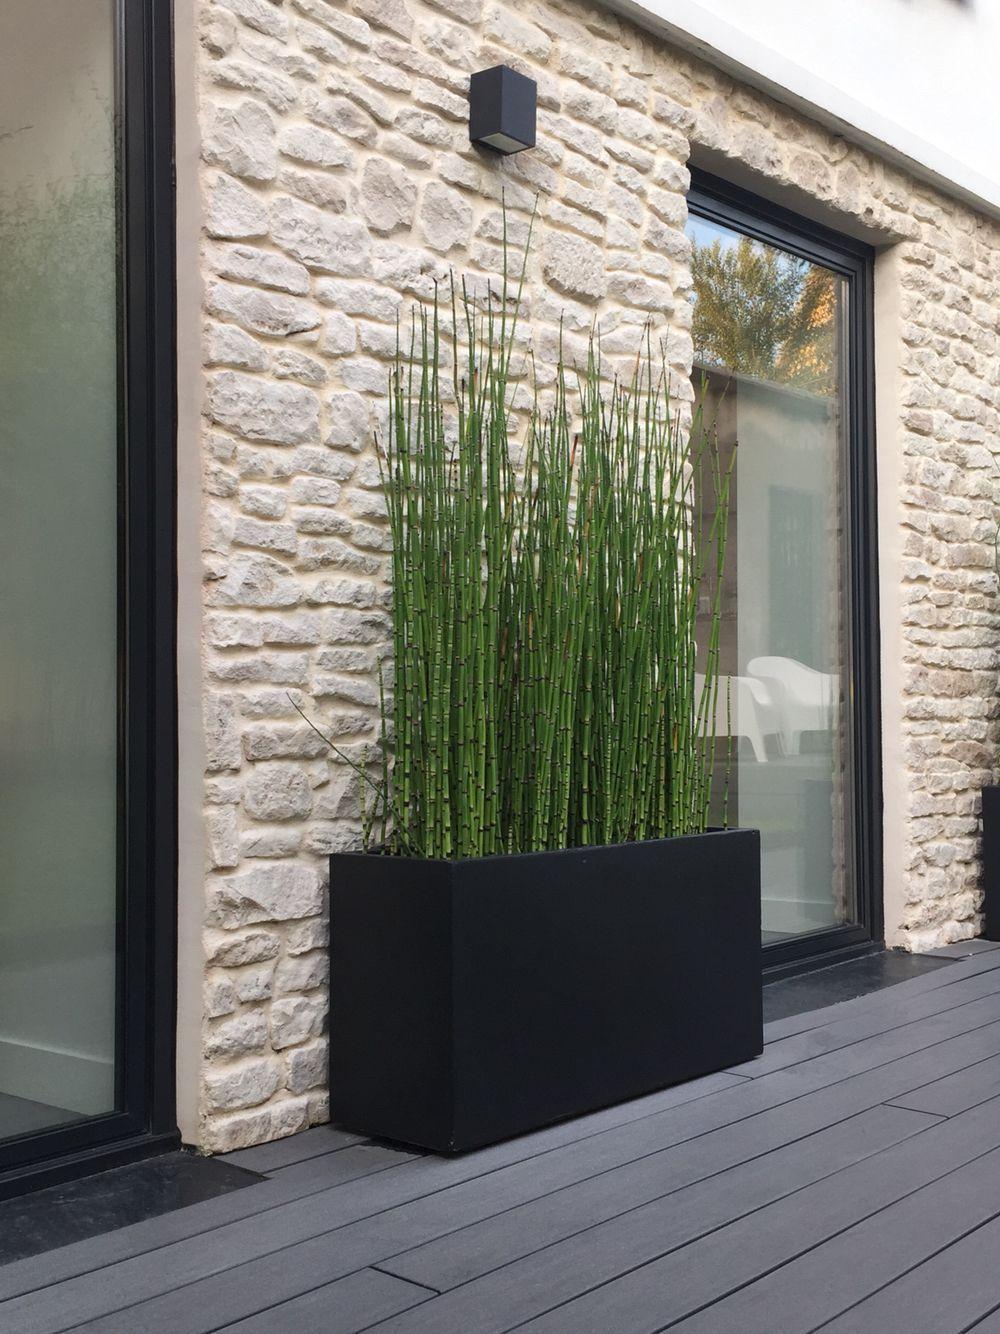 Séparation Mur Voisins | Amenagement Jardin, Terrasse Jardin ... dedans Amenagement Mur Jardin